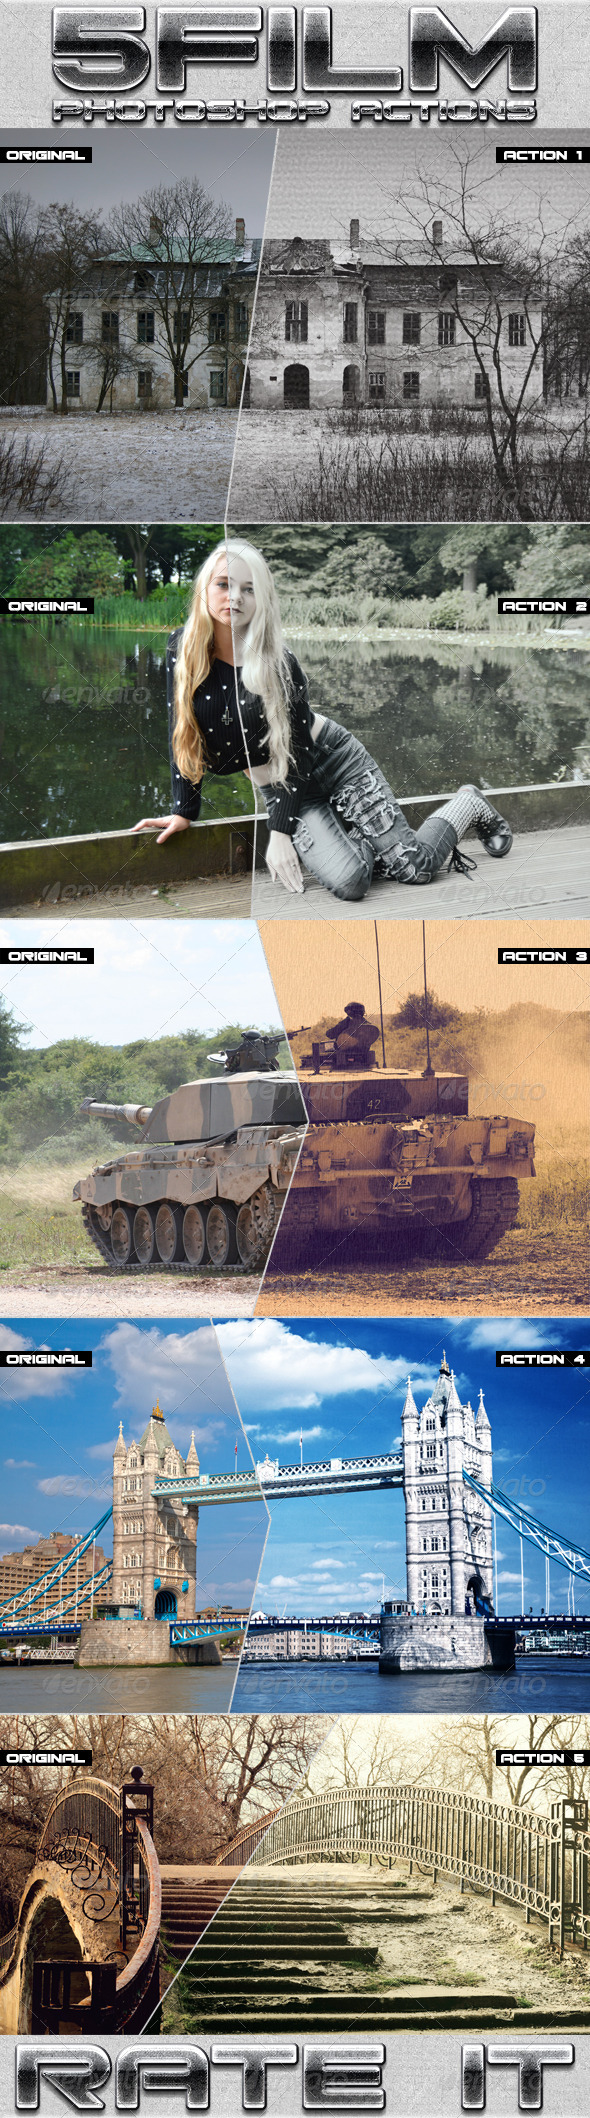 GraphicRiver Film Photoshop Actions 8118855